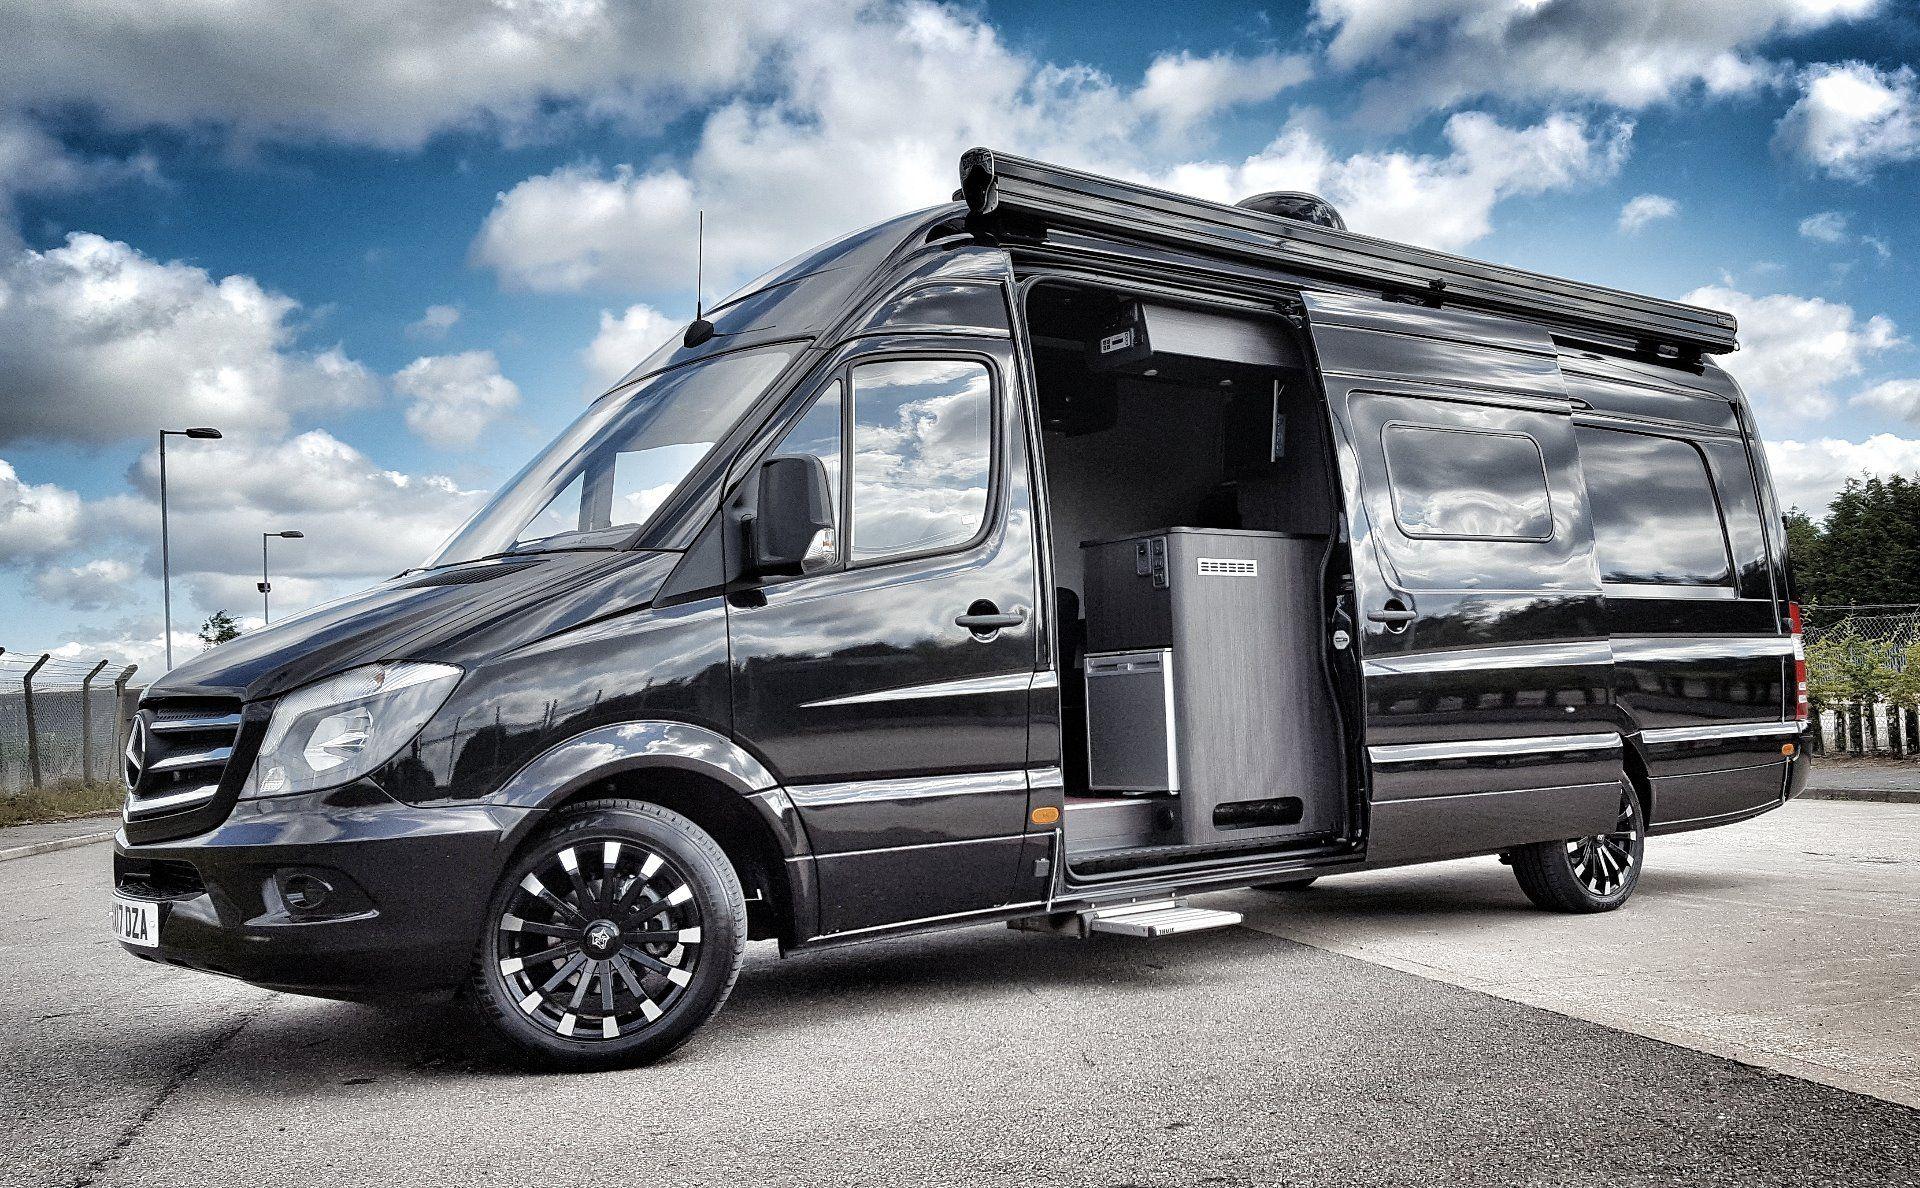 Used Rs Equinox Black Edition Mx Large Garage Obsidian Black 0 0